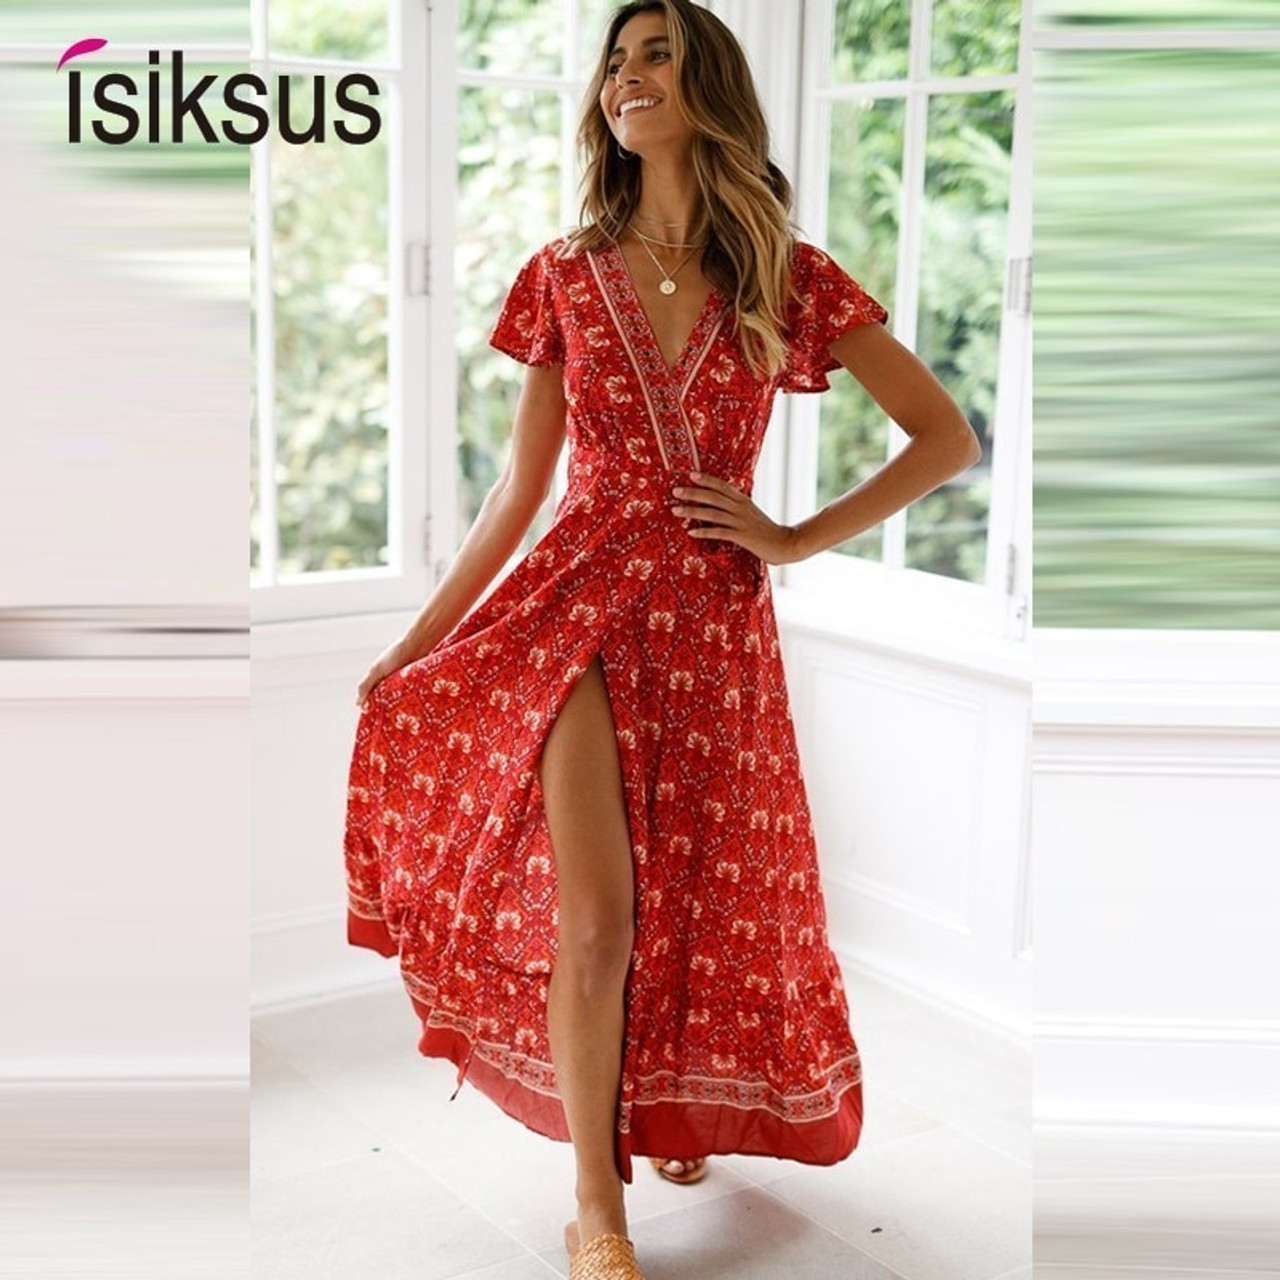 17f0aa4bc7db0 Isiksus Sexy Beach Summer Dress Women Boho Long Summer Dress Maxi Women  Dress Elegant Floral Print 2019 Bohemian Sundress DR158